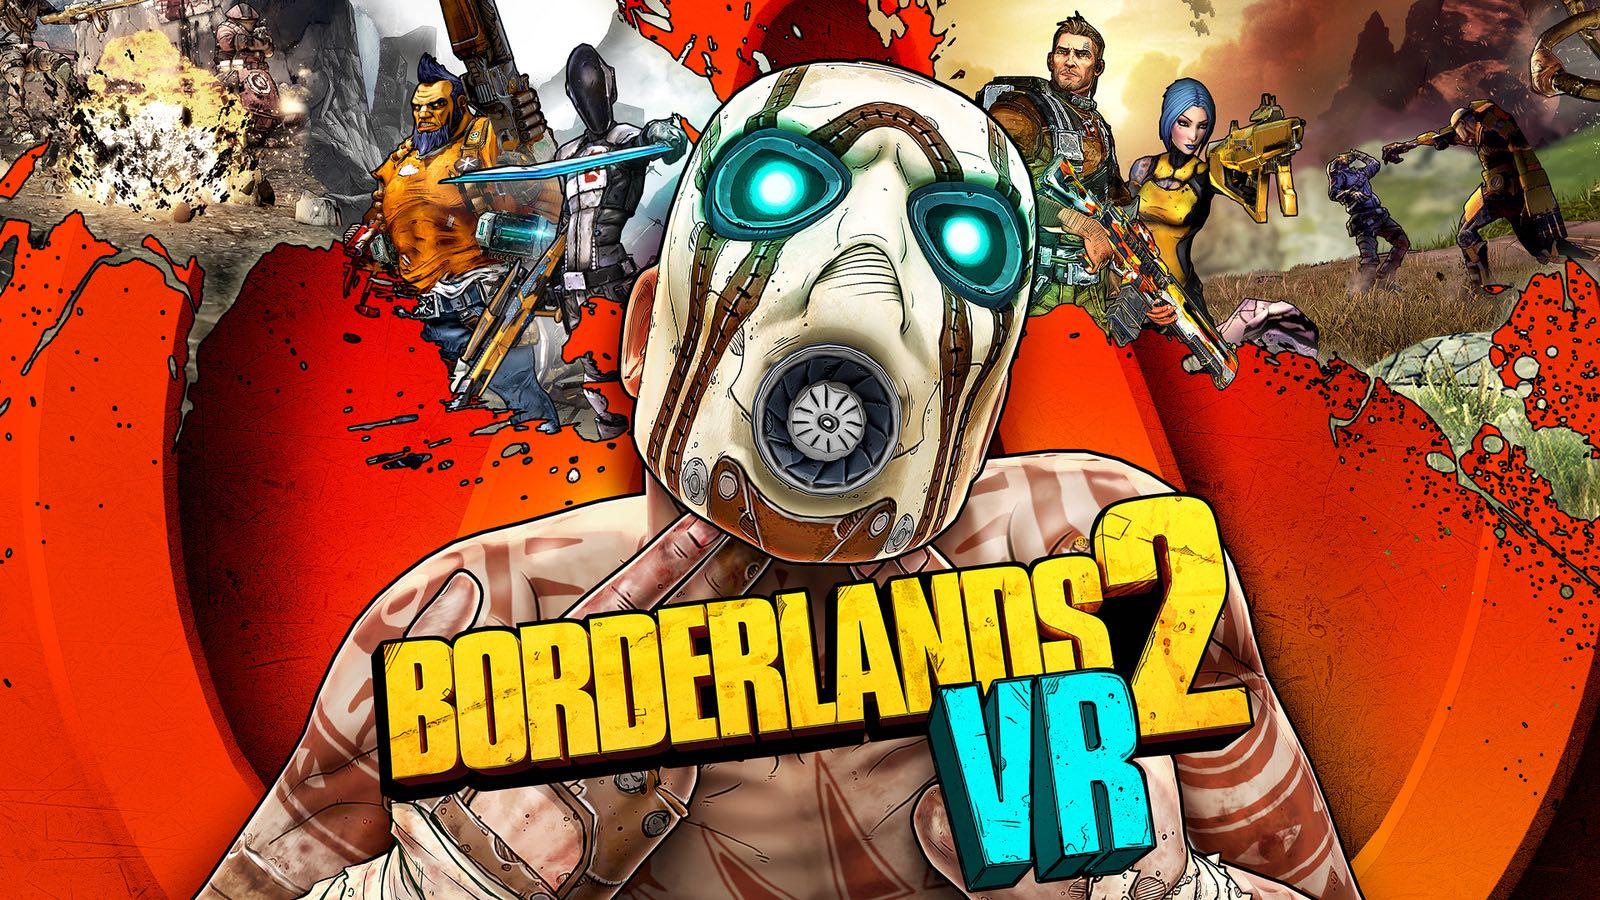 Borderlands 2' comes to PlayStation VR on December 14th